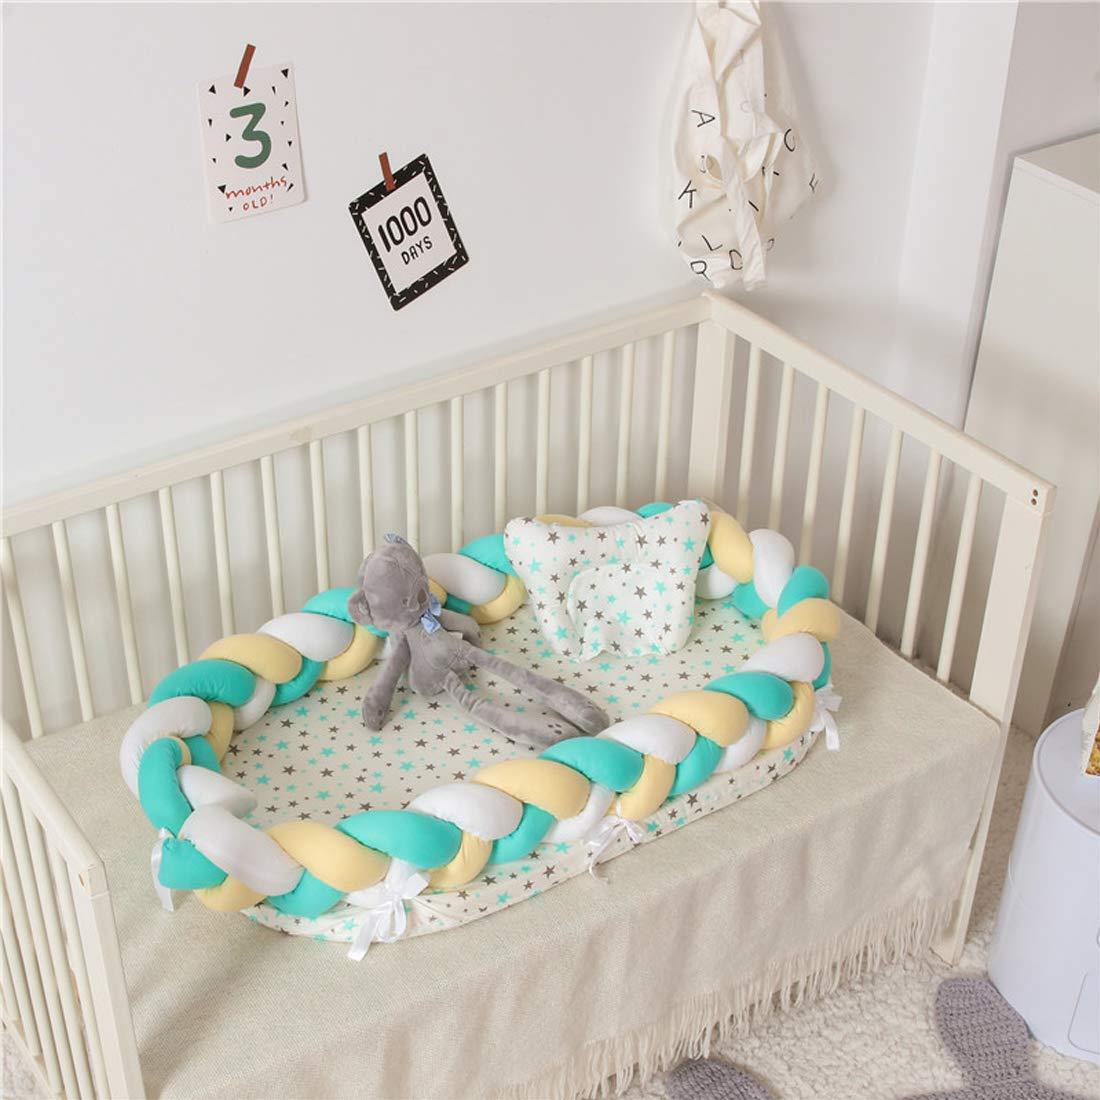 DorkasDE Babynest Kuschelnest Matratze im Bett Faltbett Babybett Reisebett mit Abnehmbarer Zaun